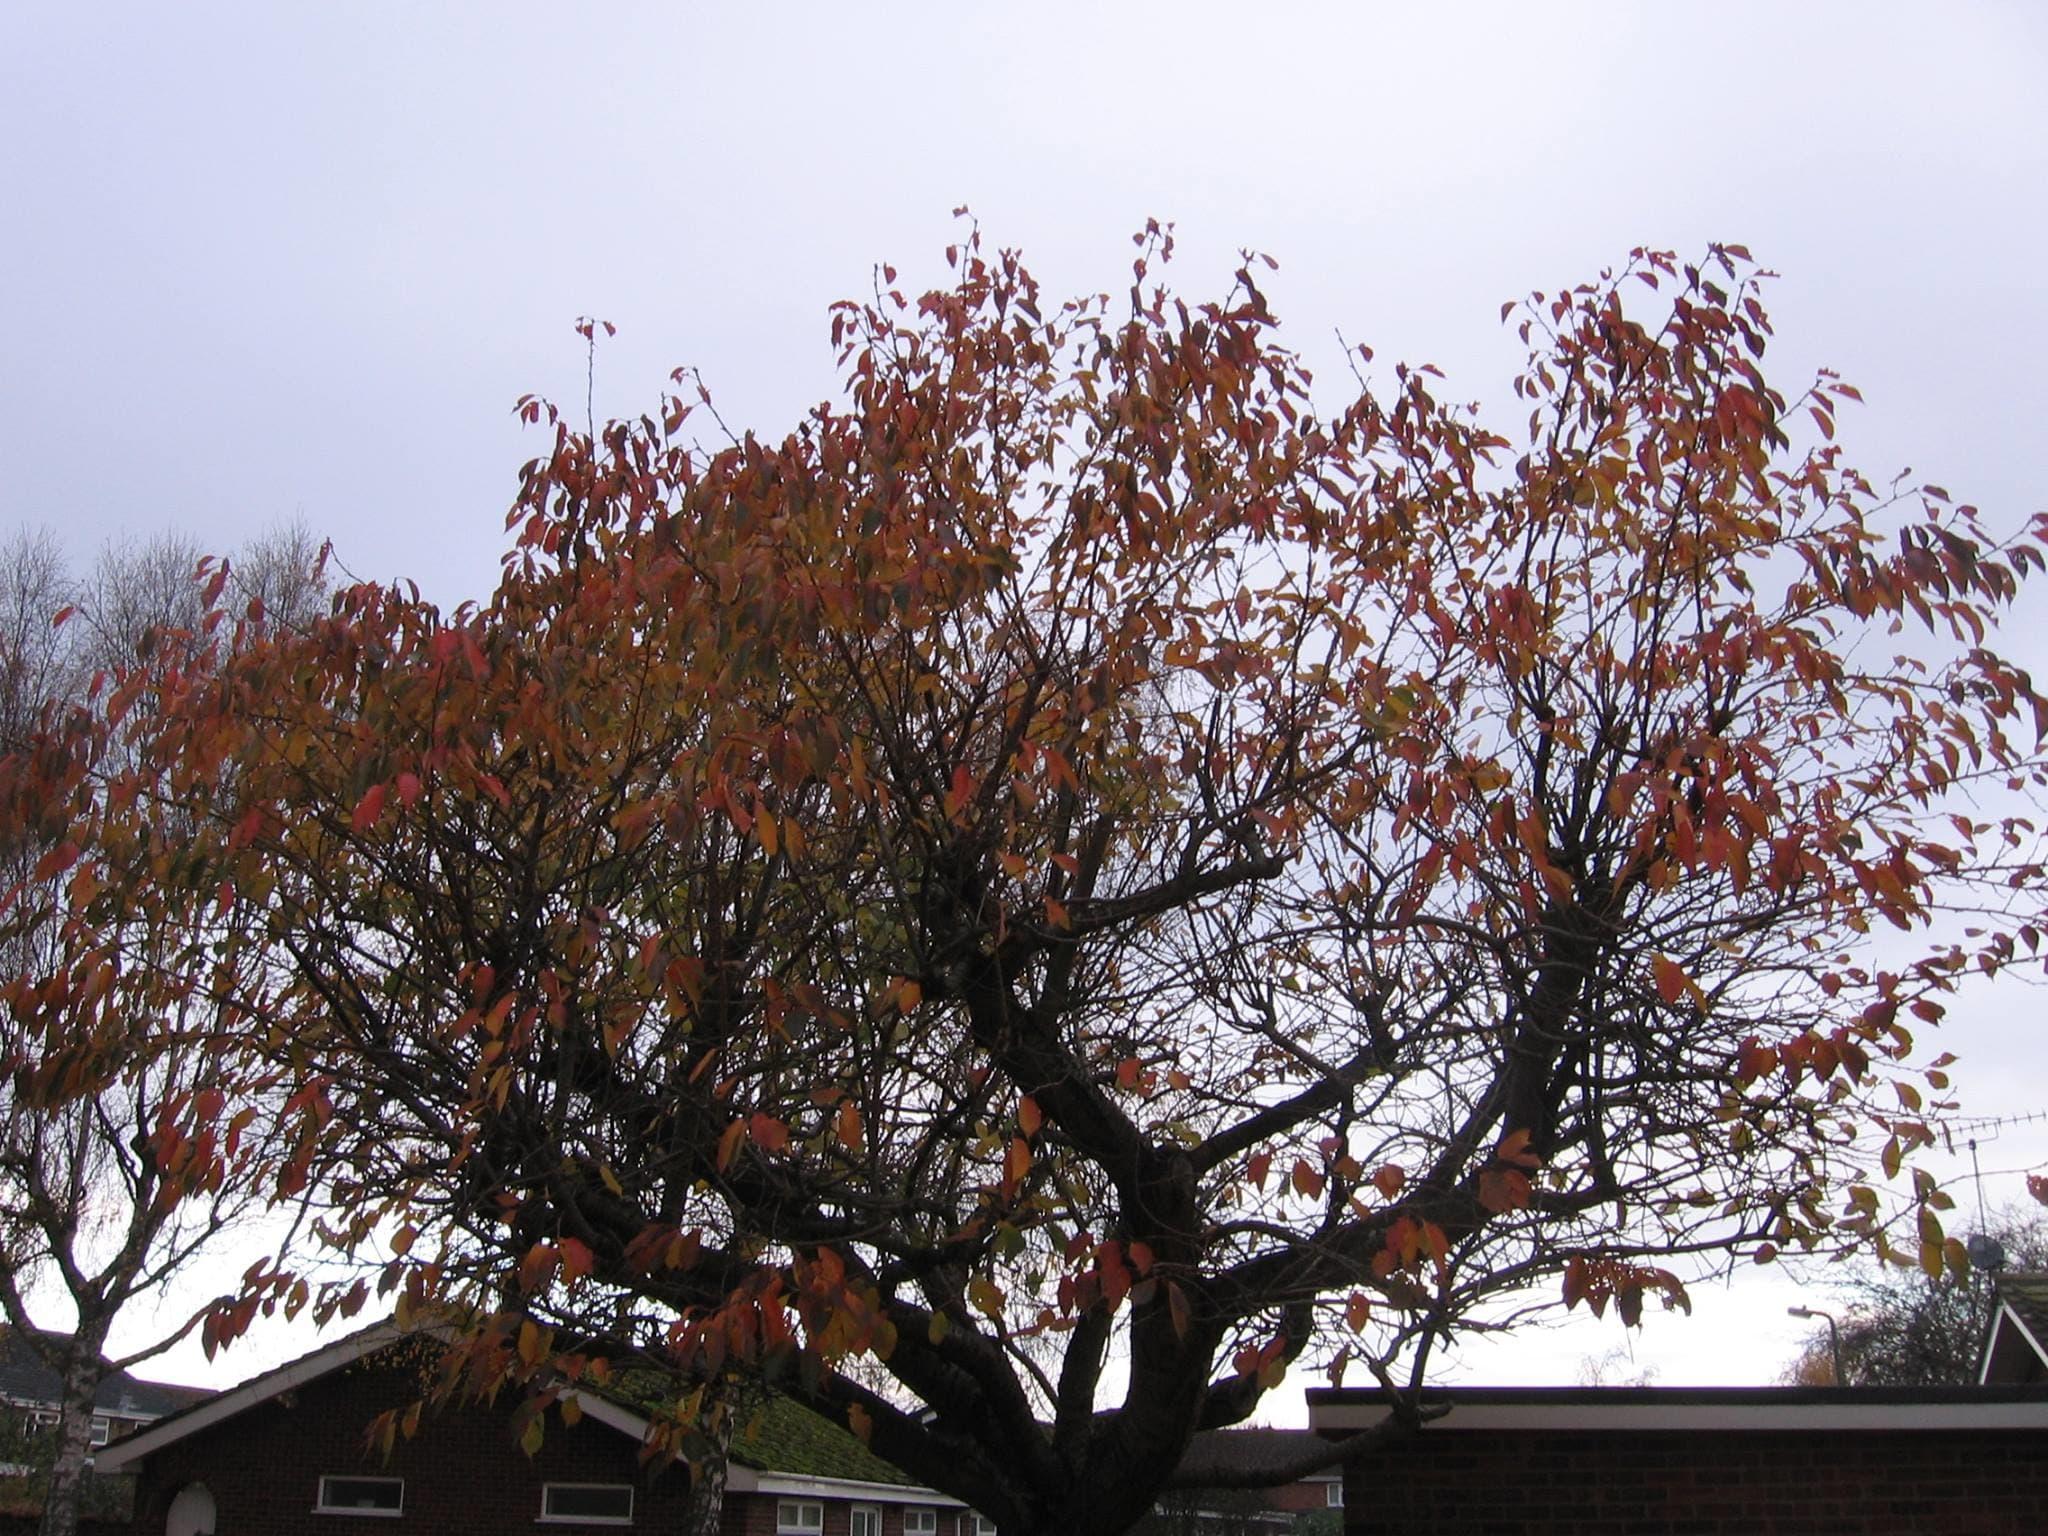 Crown / Canopy Raising